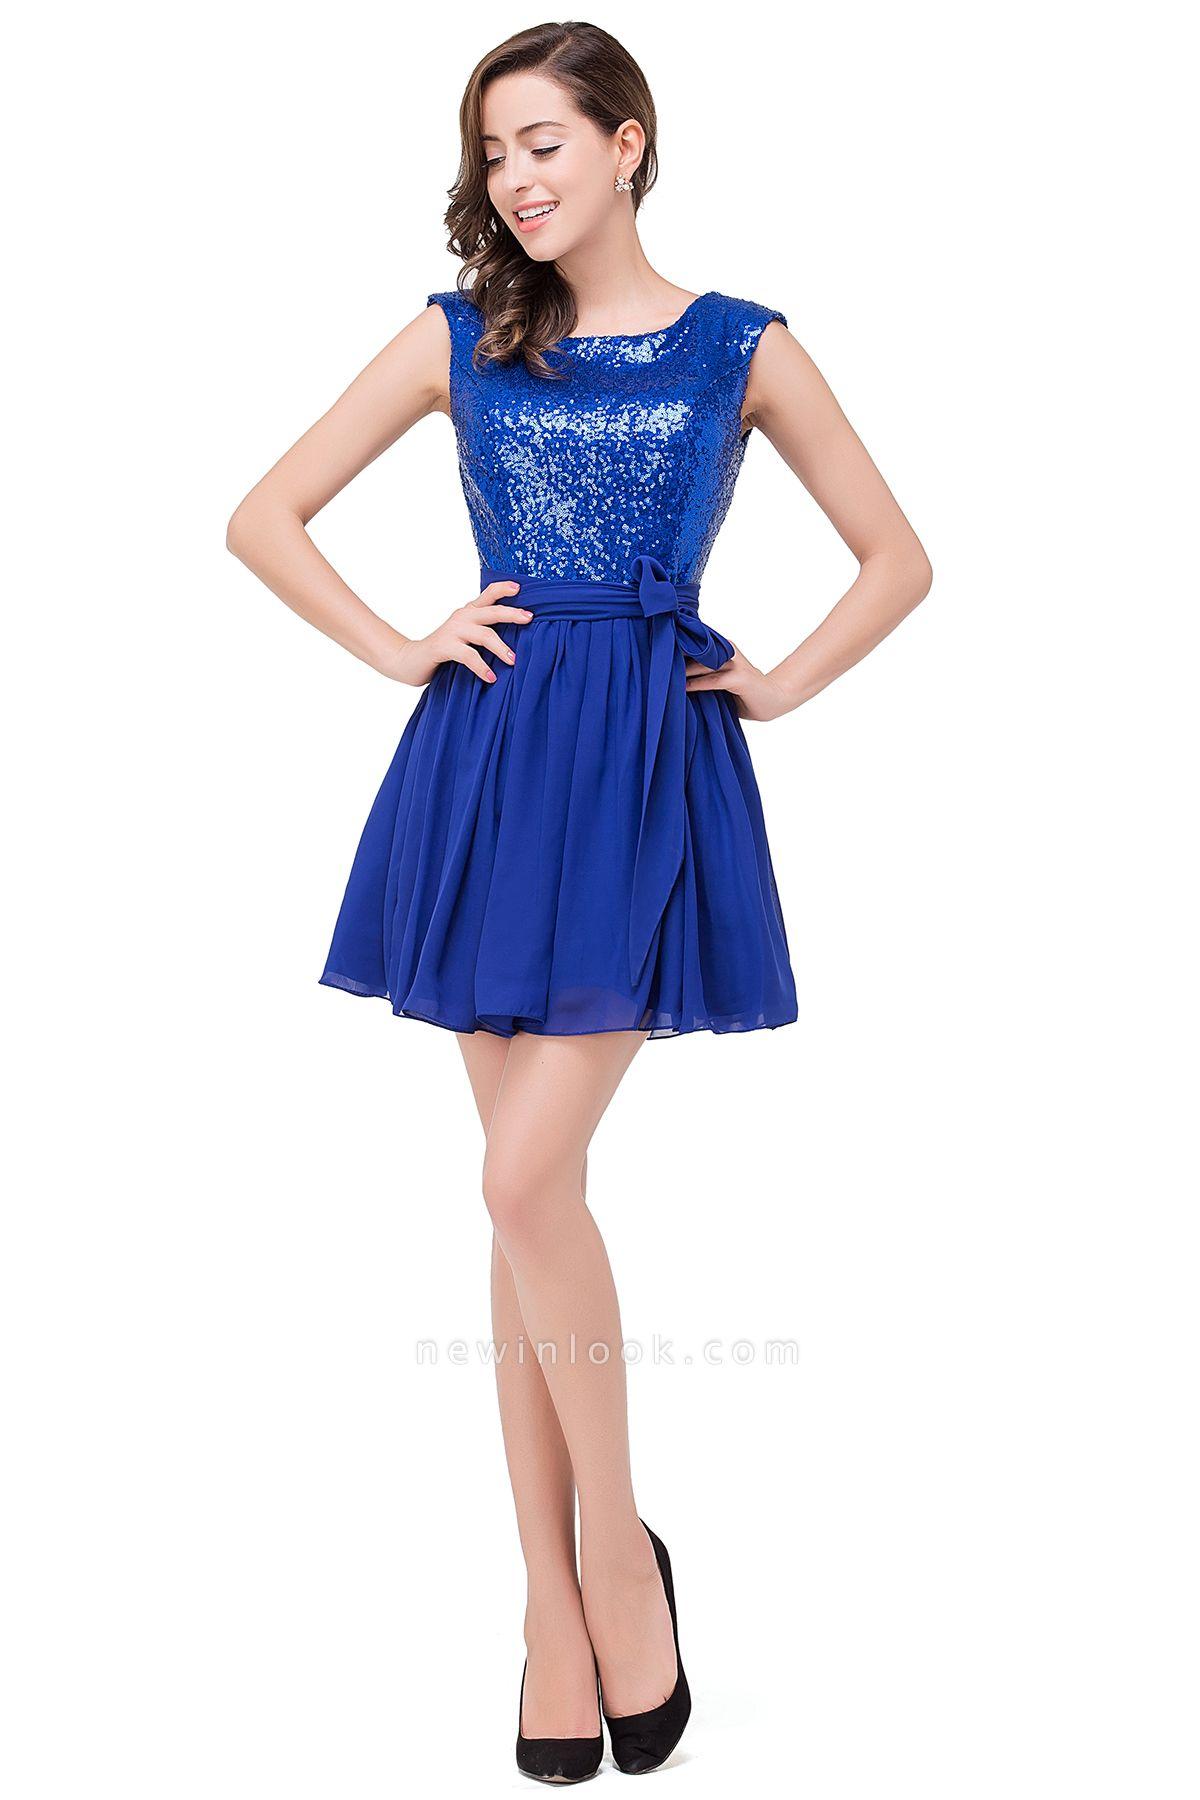 EMERSYN | Quinceanera Sleeveless Sequins Chiffon Short Dama Dresses